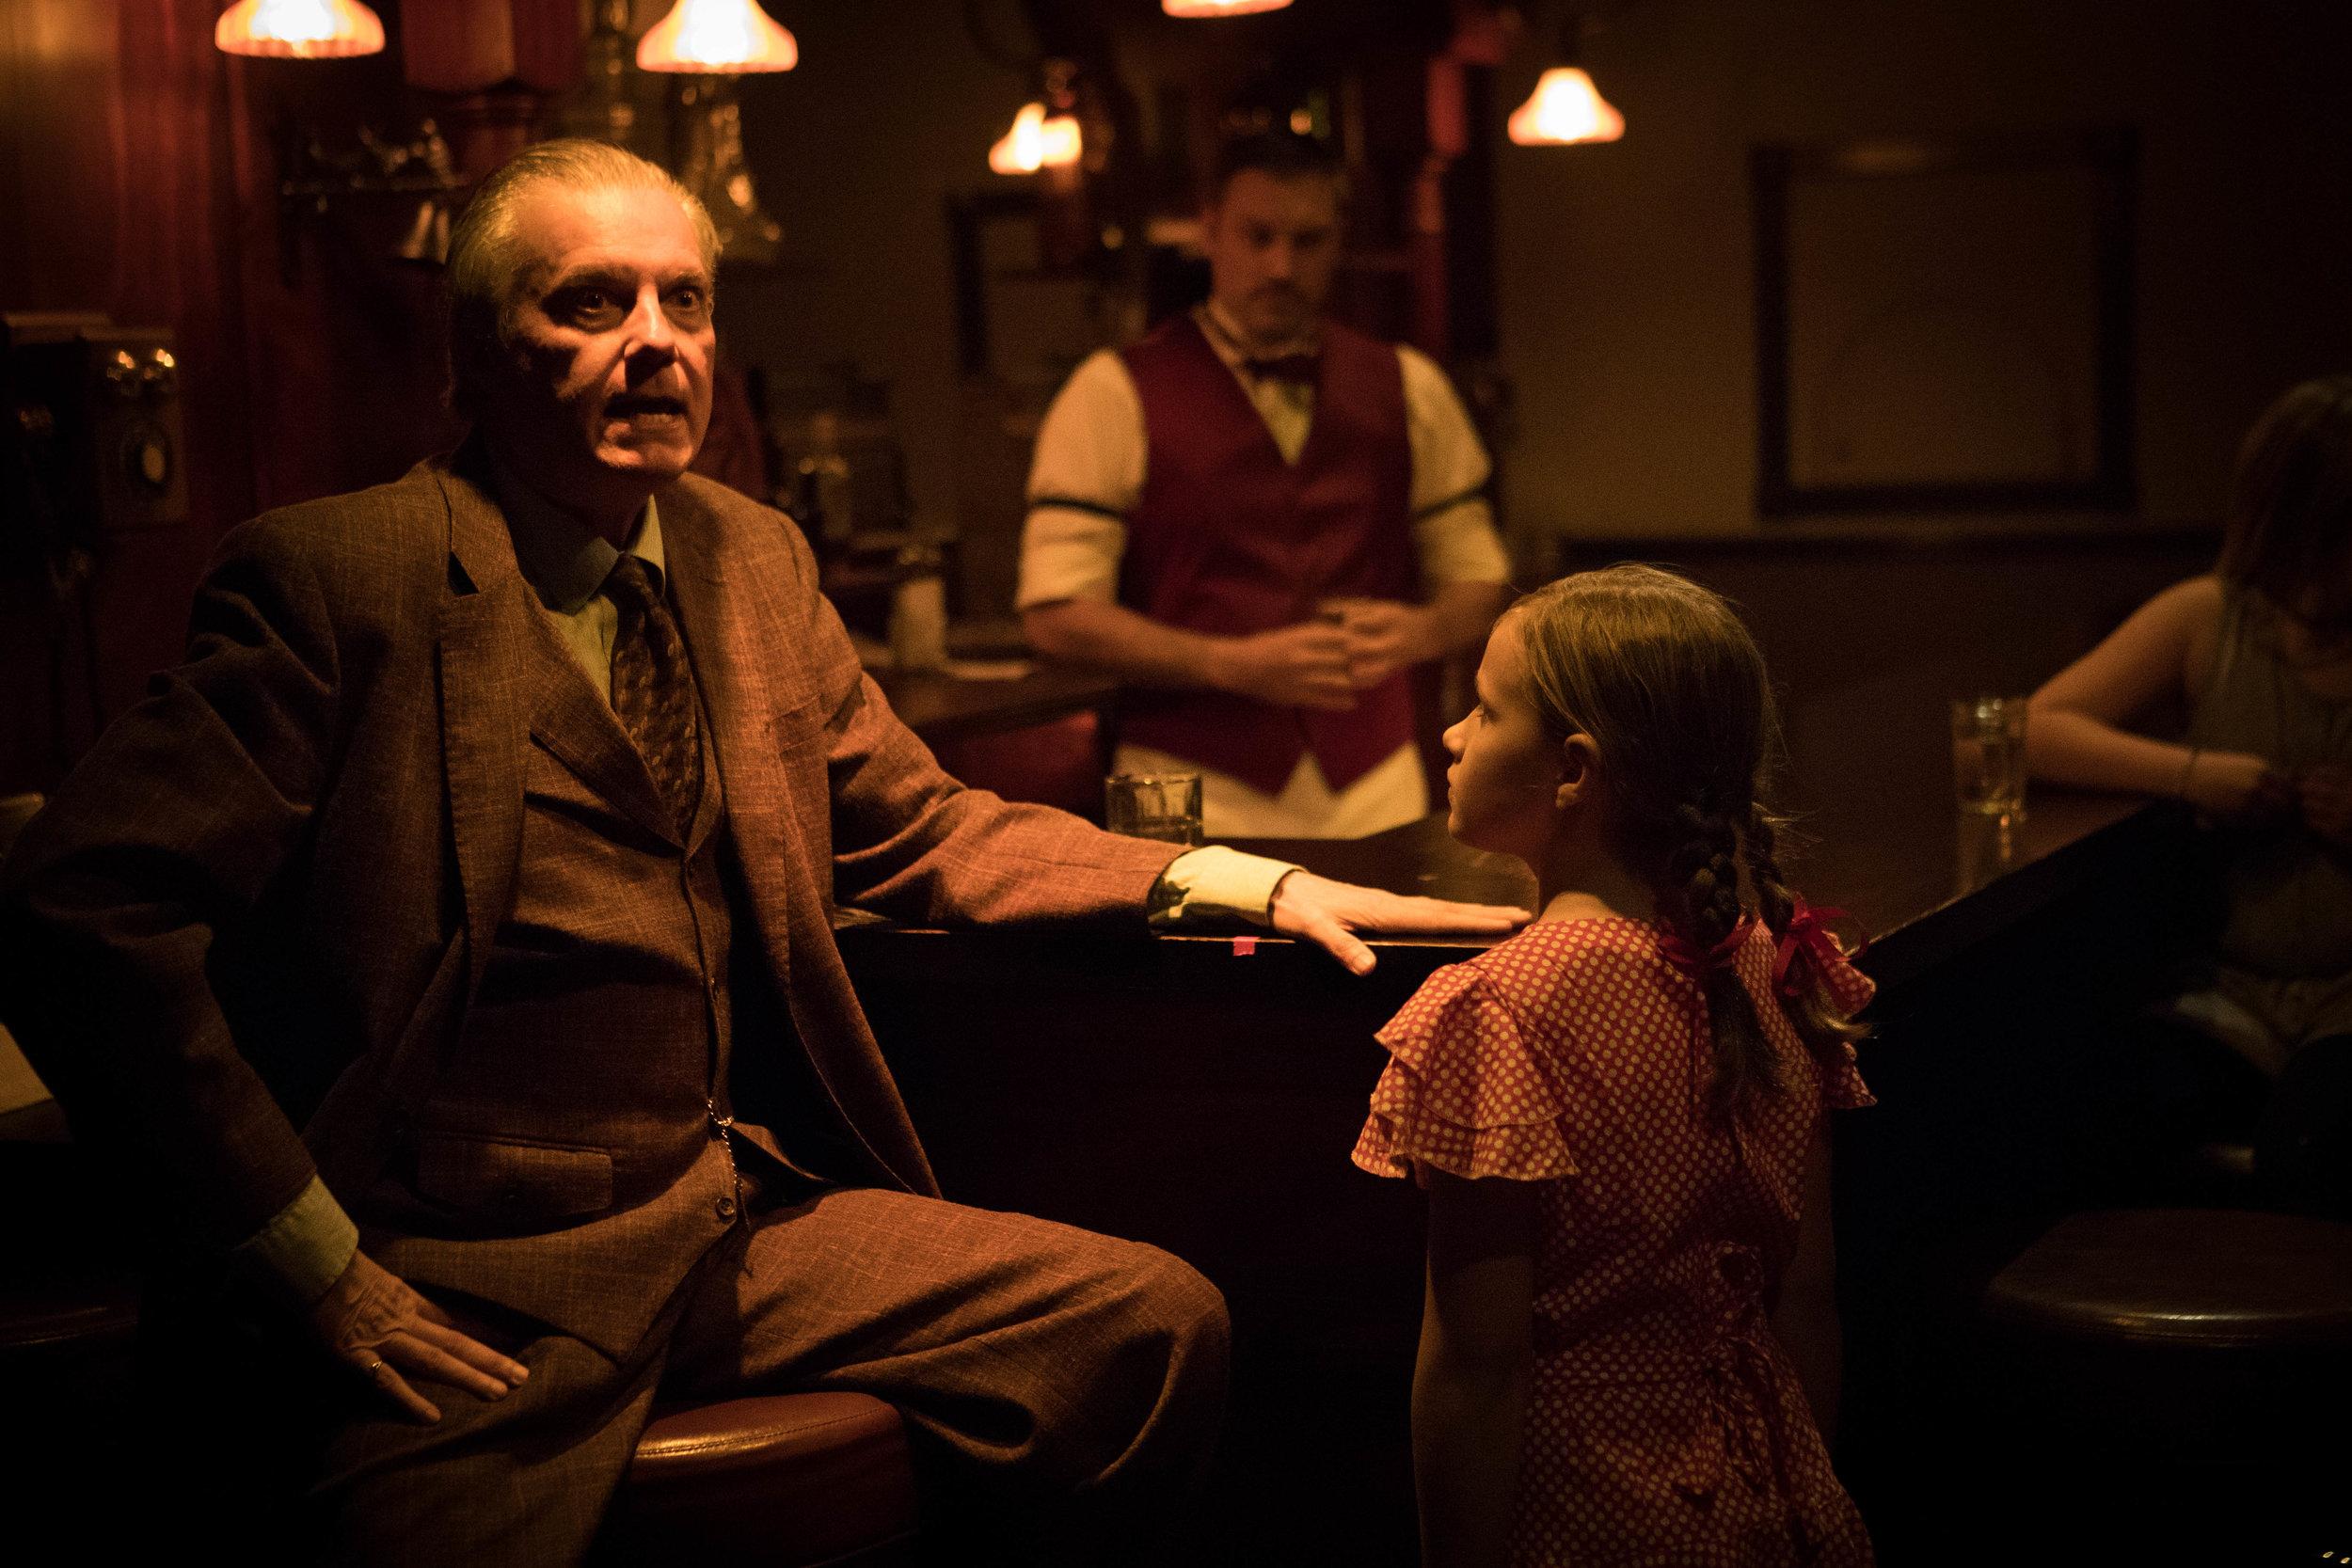 Rasa Hill as Tom, Cooper Carlson as Mac, and Violet Gluck as Sarah in The Speakeasy. Photo by Peter Liu.jpg